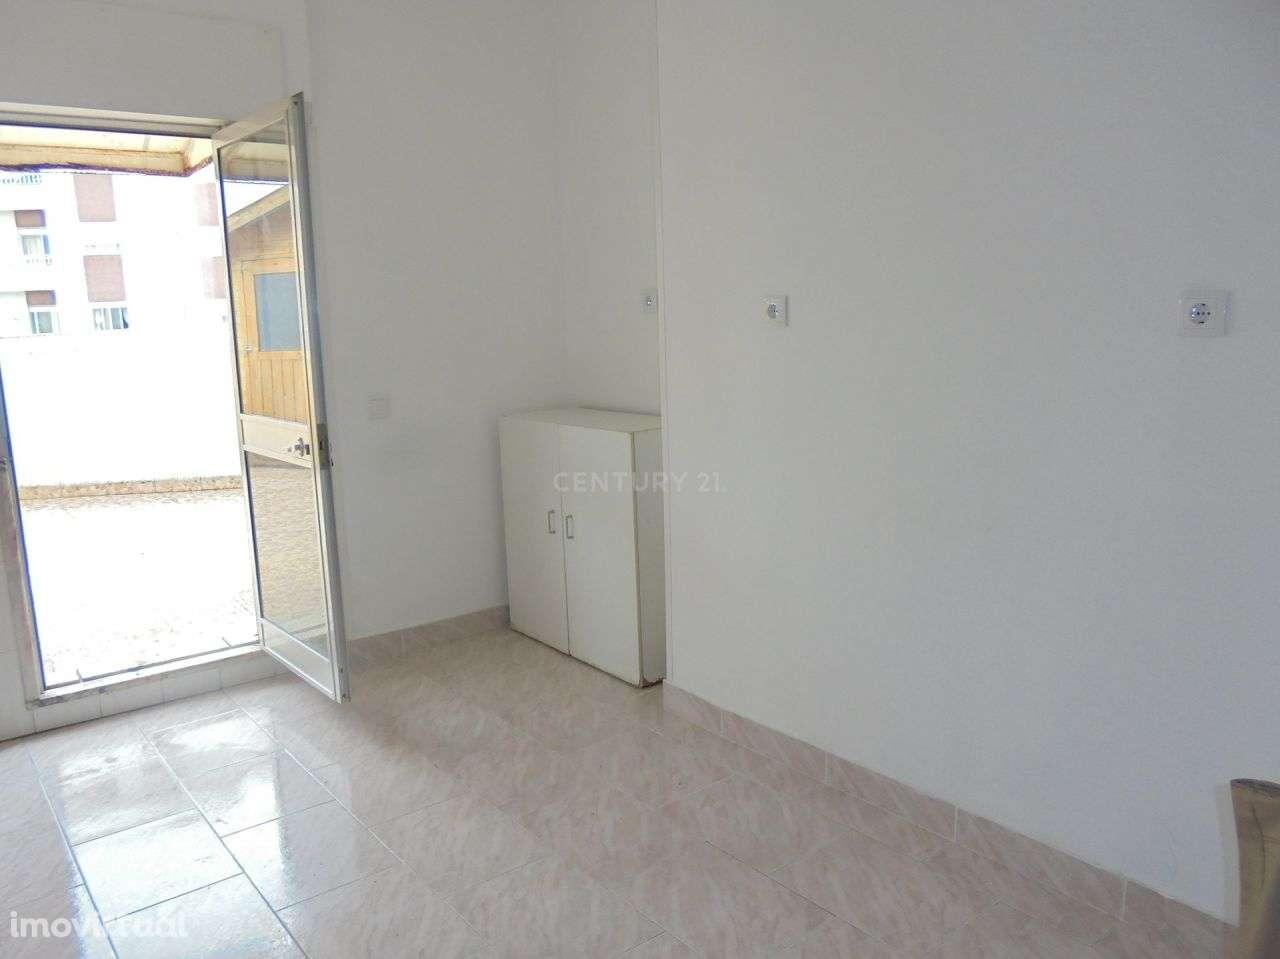 Apartamento para comprar, Póvoa de Santa Iria e Forte da Casa, Vila Franca de Xira, Lisboa - Foto 6